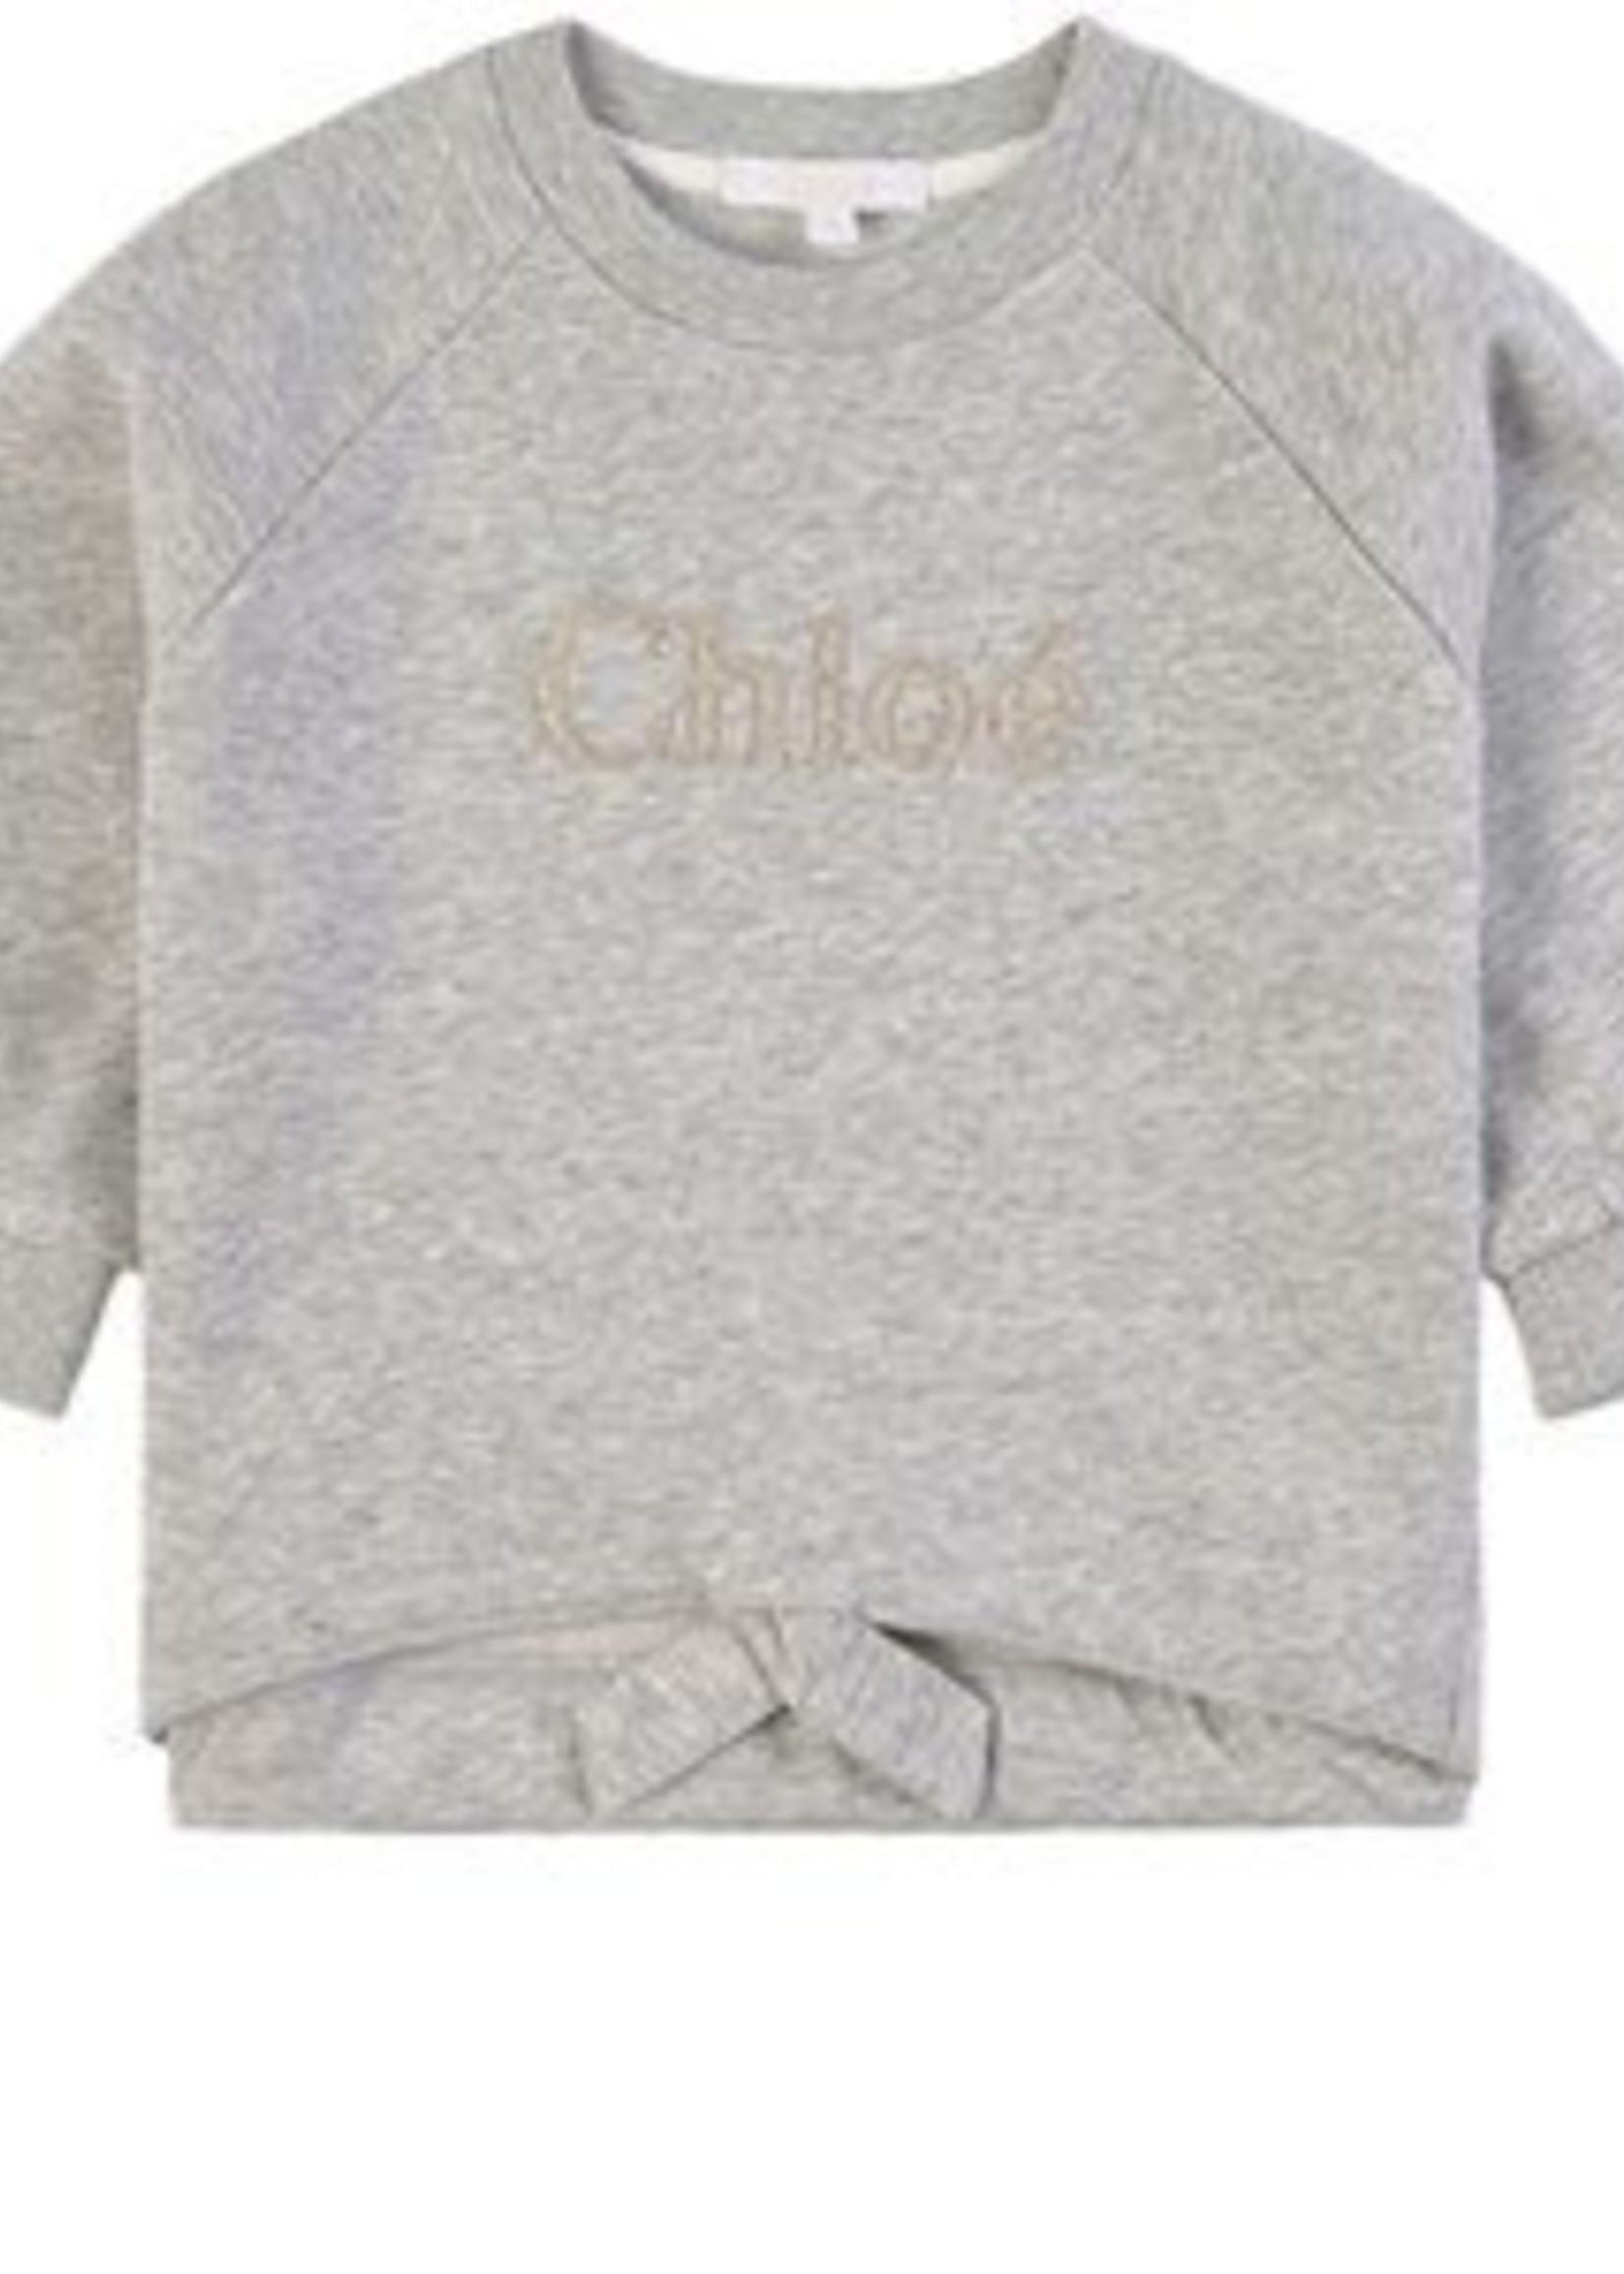 Chloe Chloe-ss21 Cl5B79 sweater